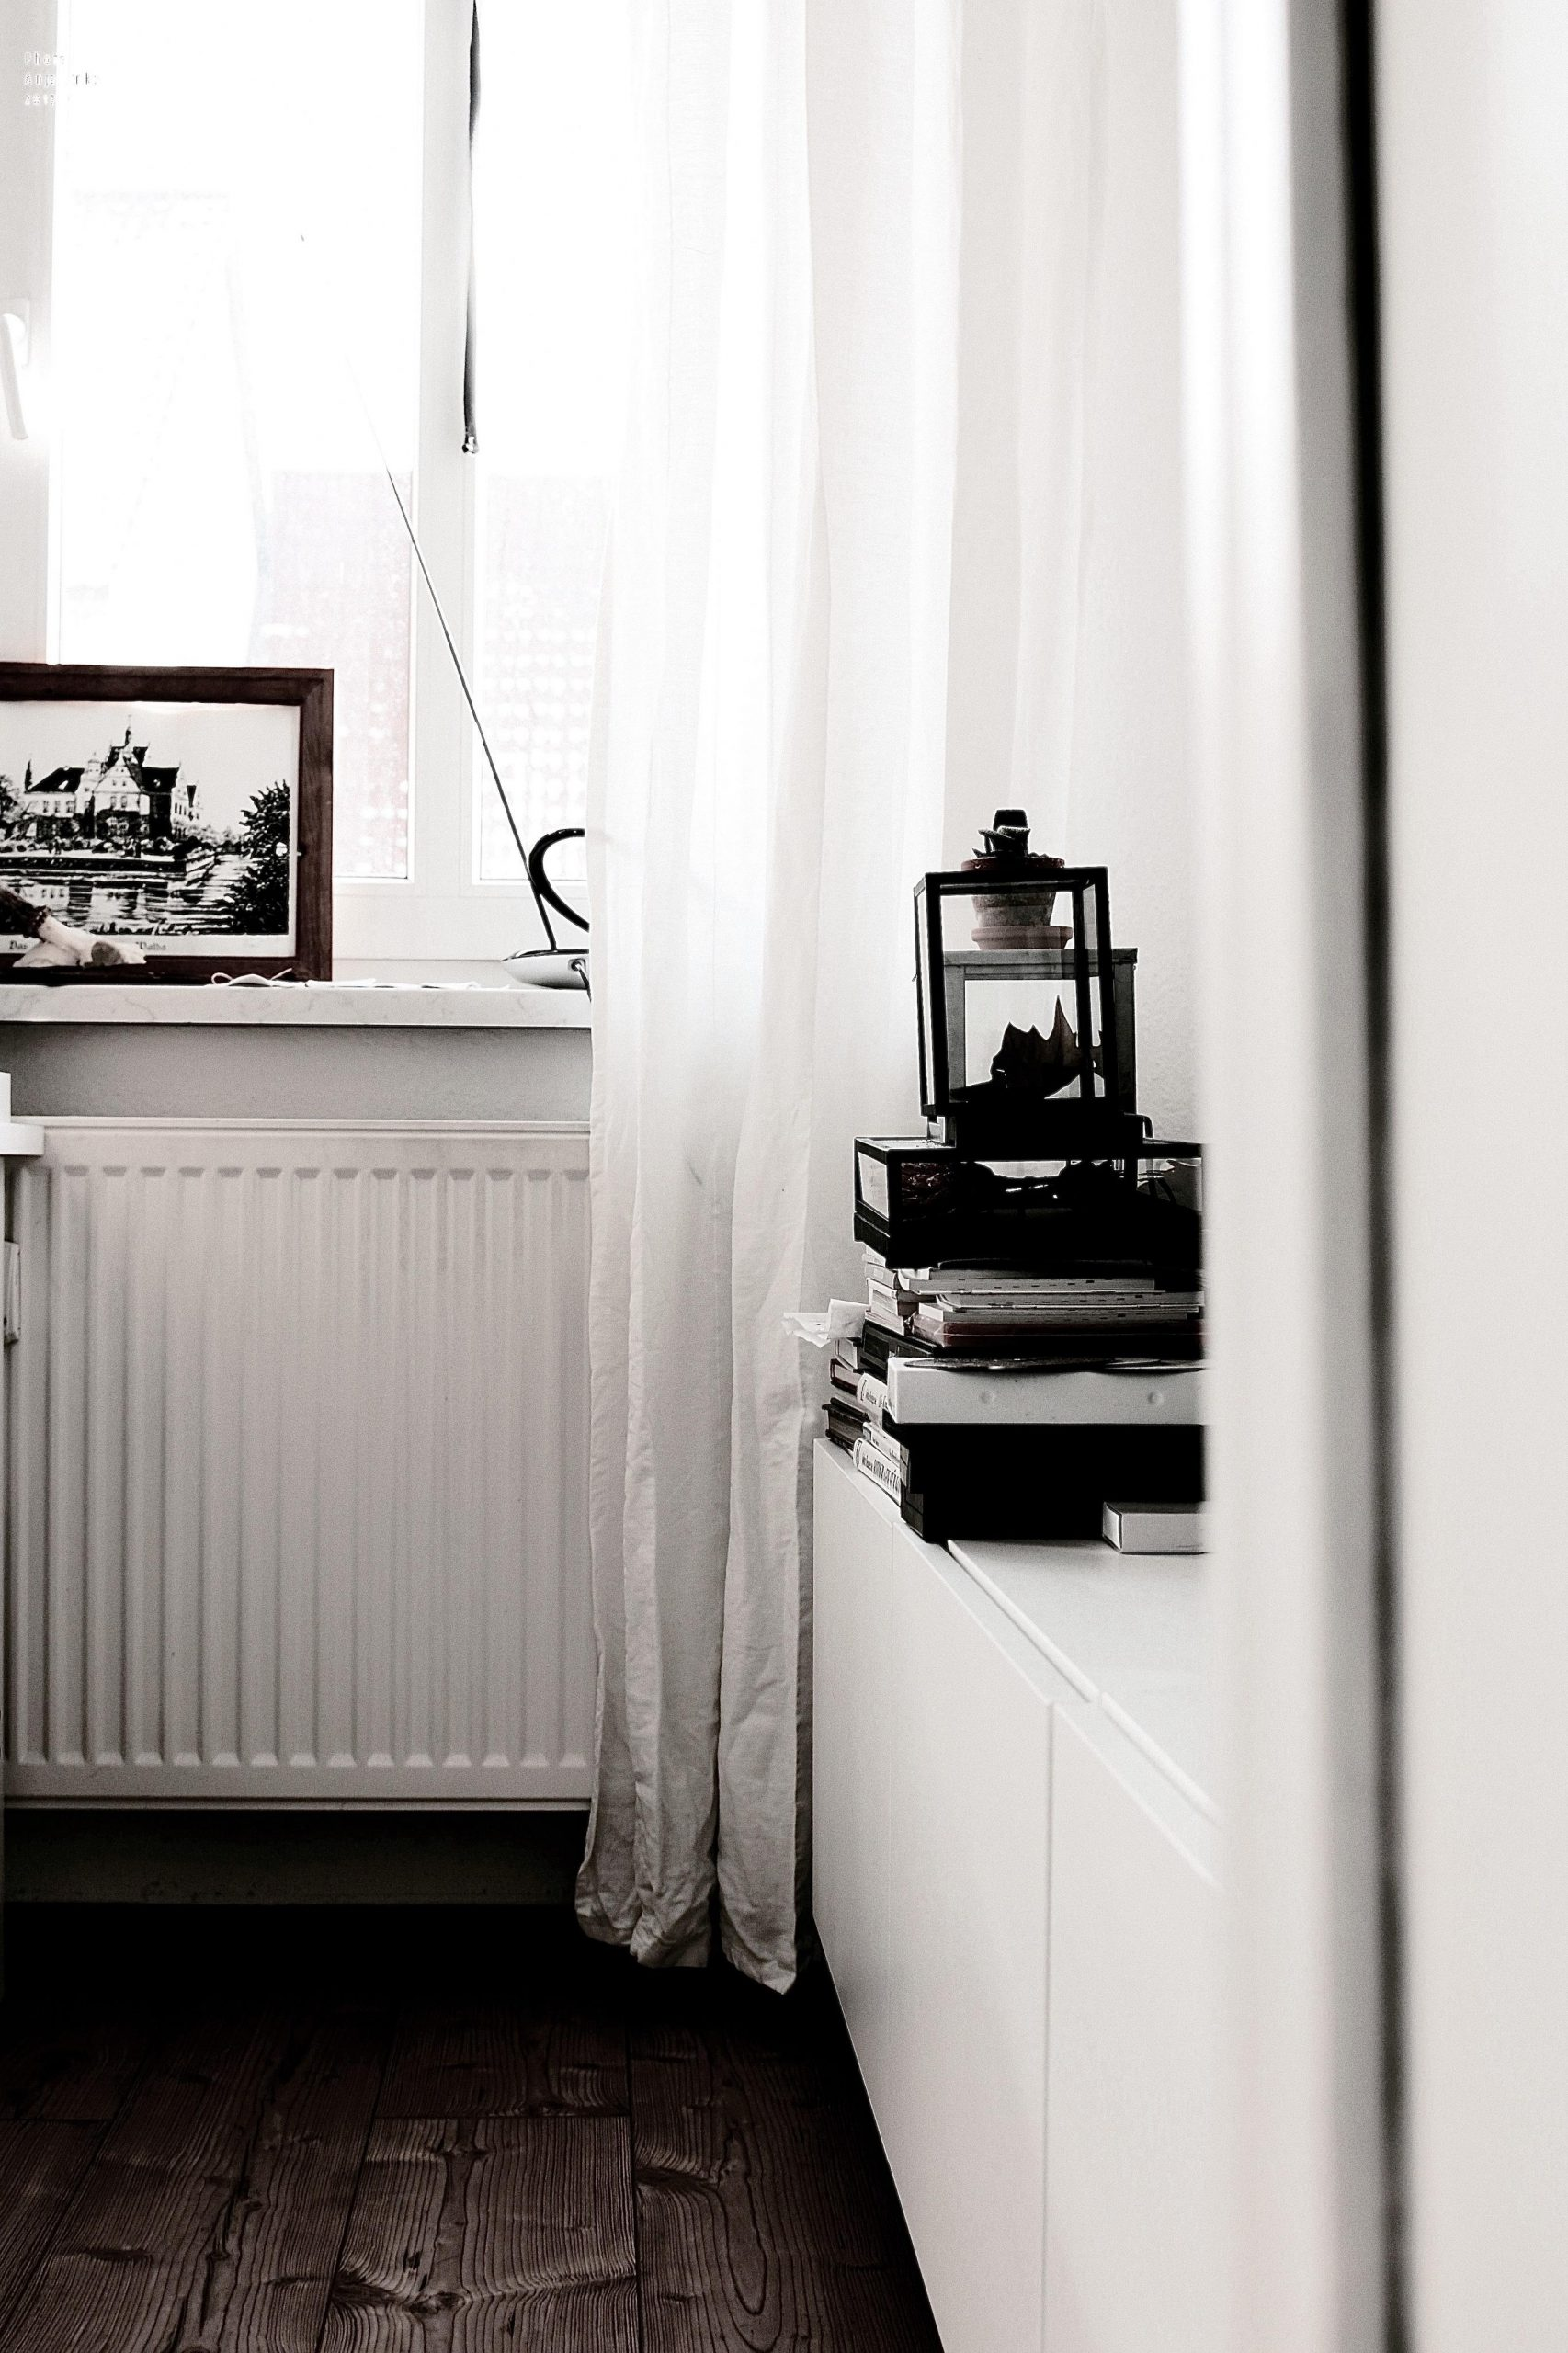 Full Size of Heizkörper Wohnzimmer Verkleiden Heizkörper Für Wohnzimmer Design Heizkörper Wohnzimmer Kermi Heizkörper Edelstahl Wohnzimmer Wohnzimmer Heizkörper Wohnzimmer